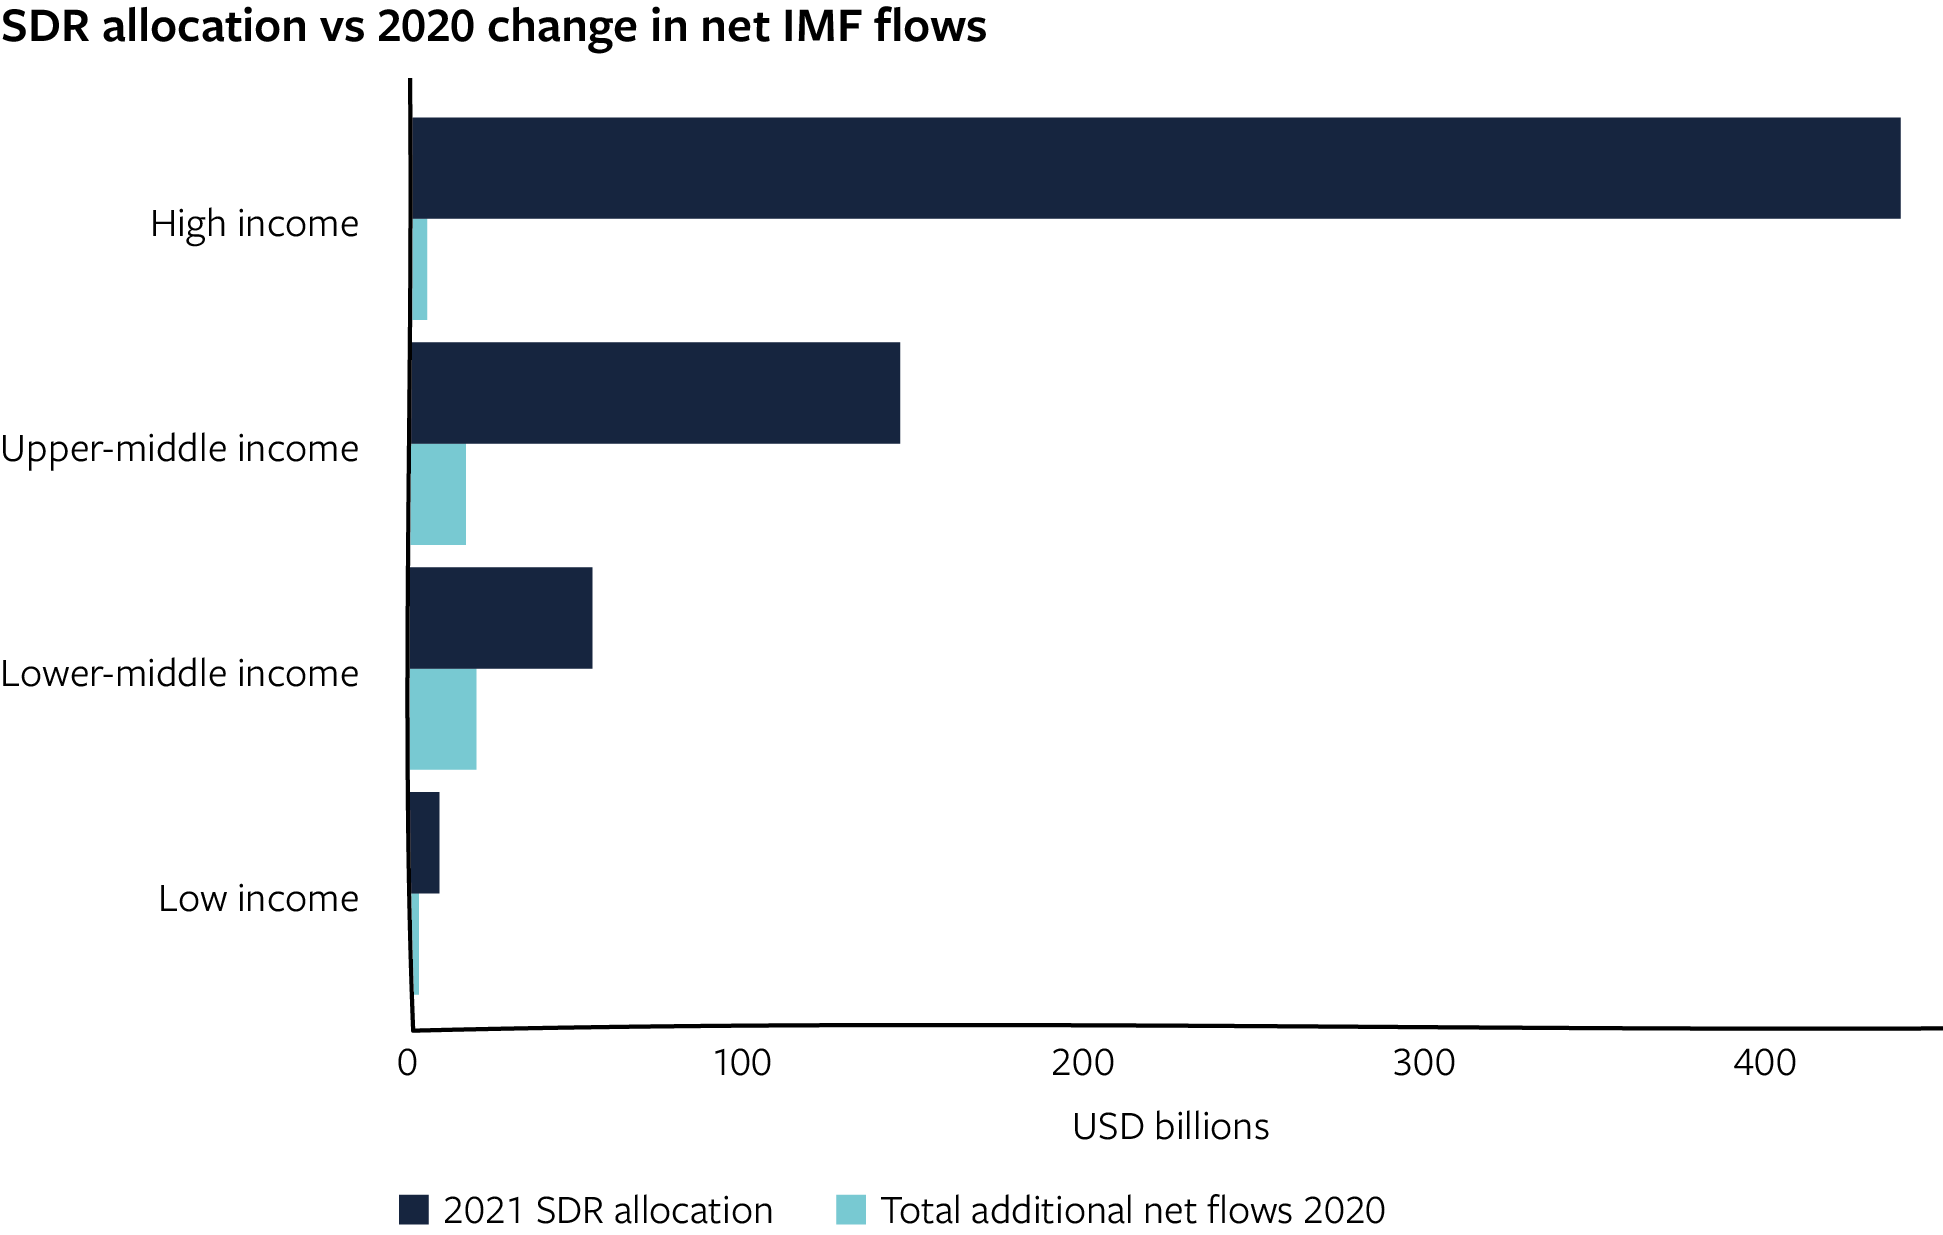 SDR allocation vs 2020 change in net IMF flows